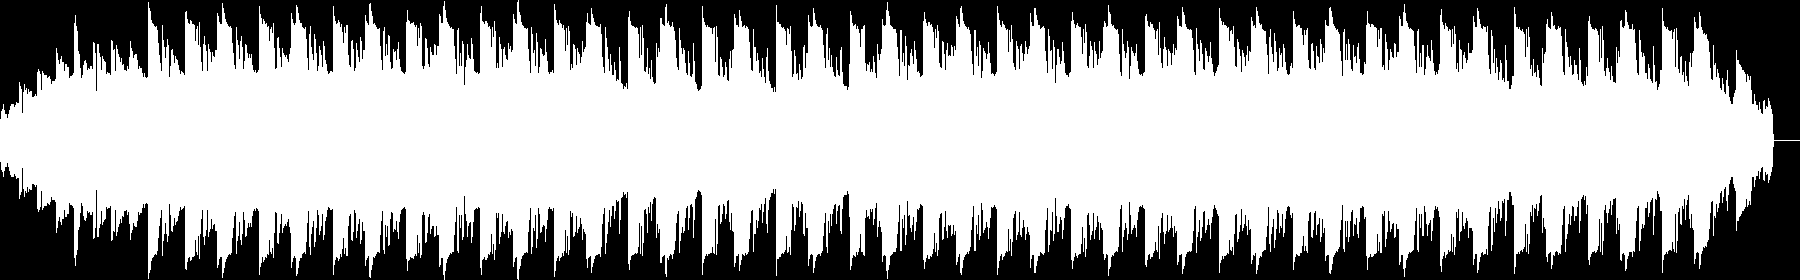 Chiraq Drillinois audio waveform